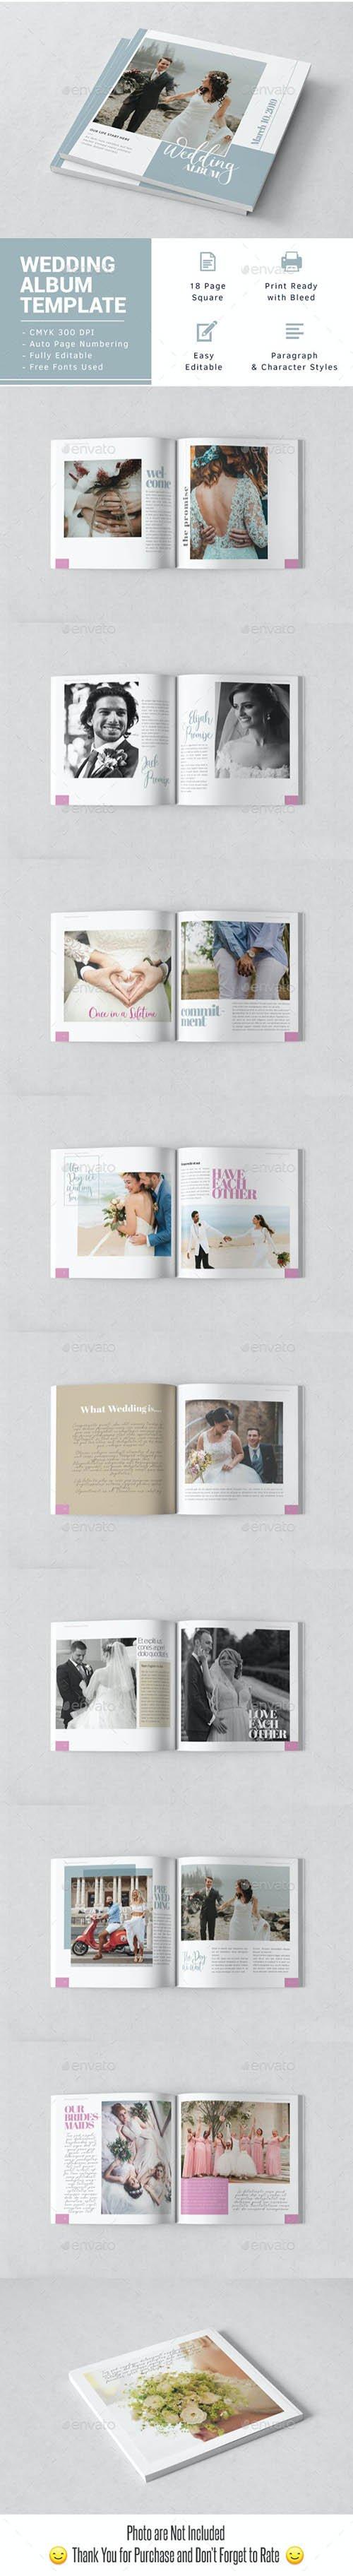 GraphicRiver - Wedding Album Indesign Template 23810557